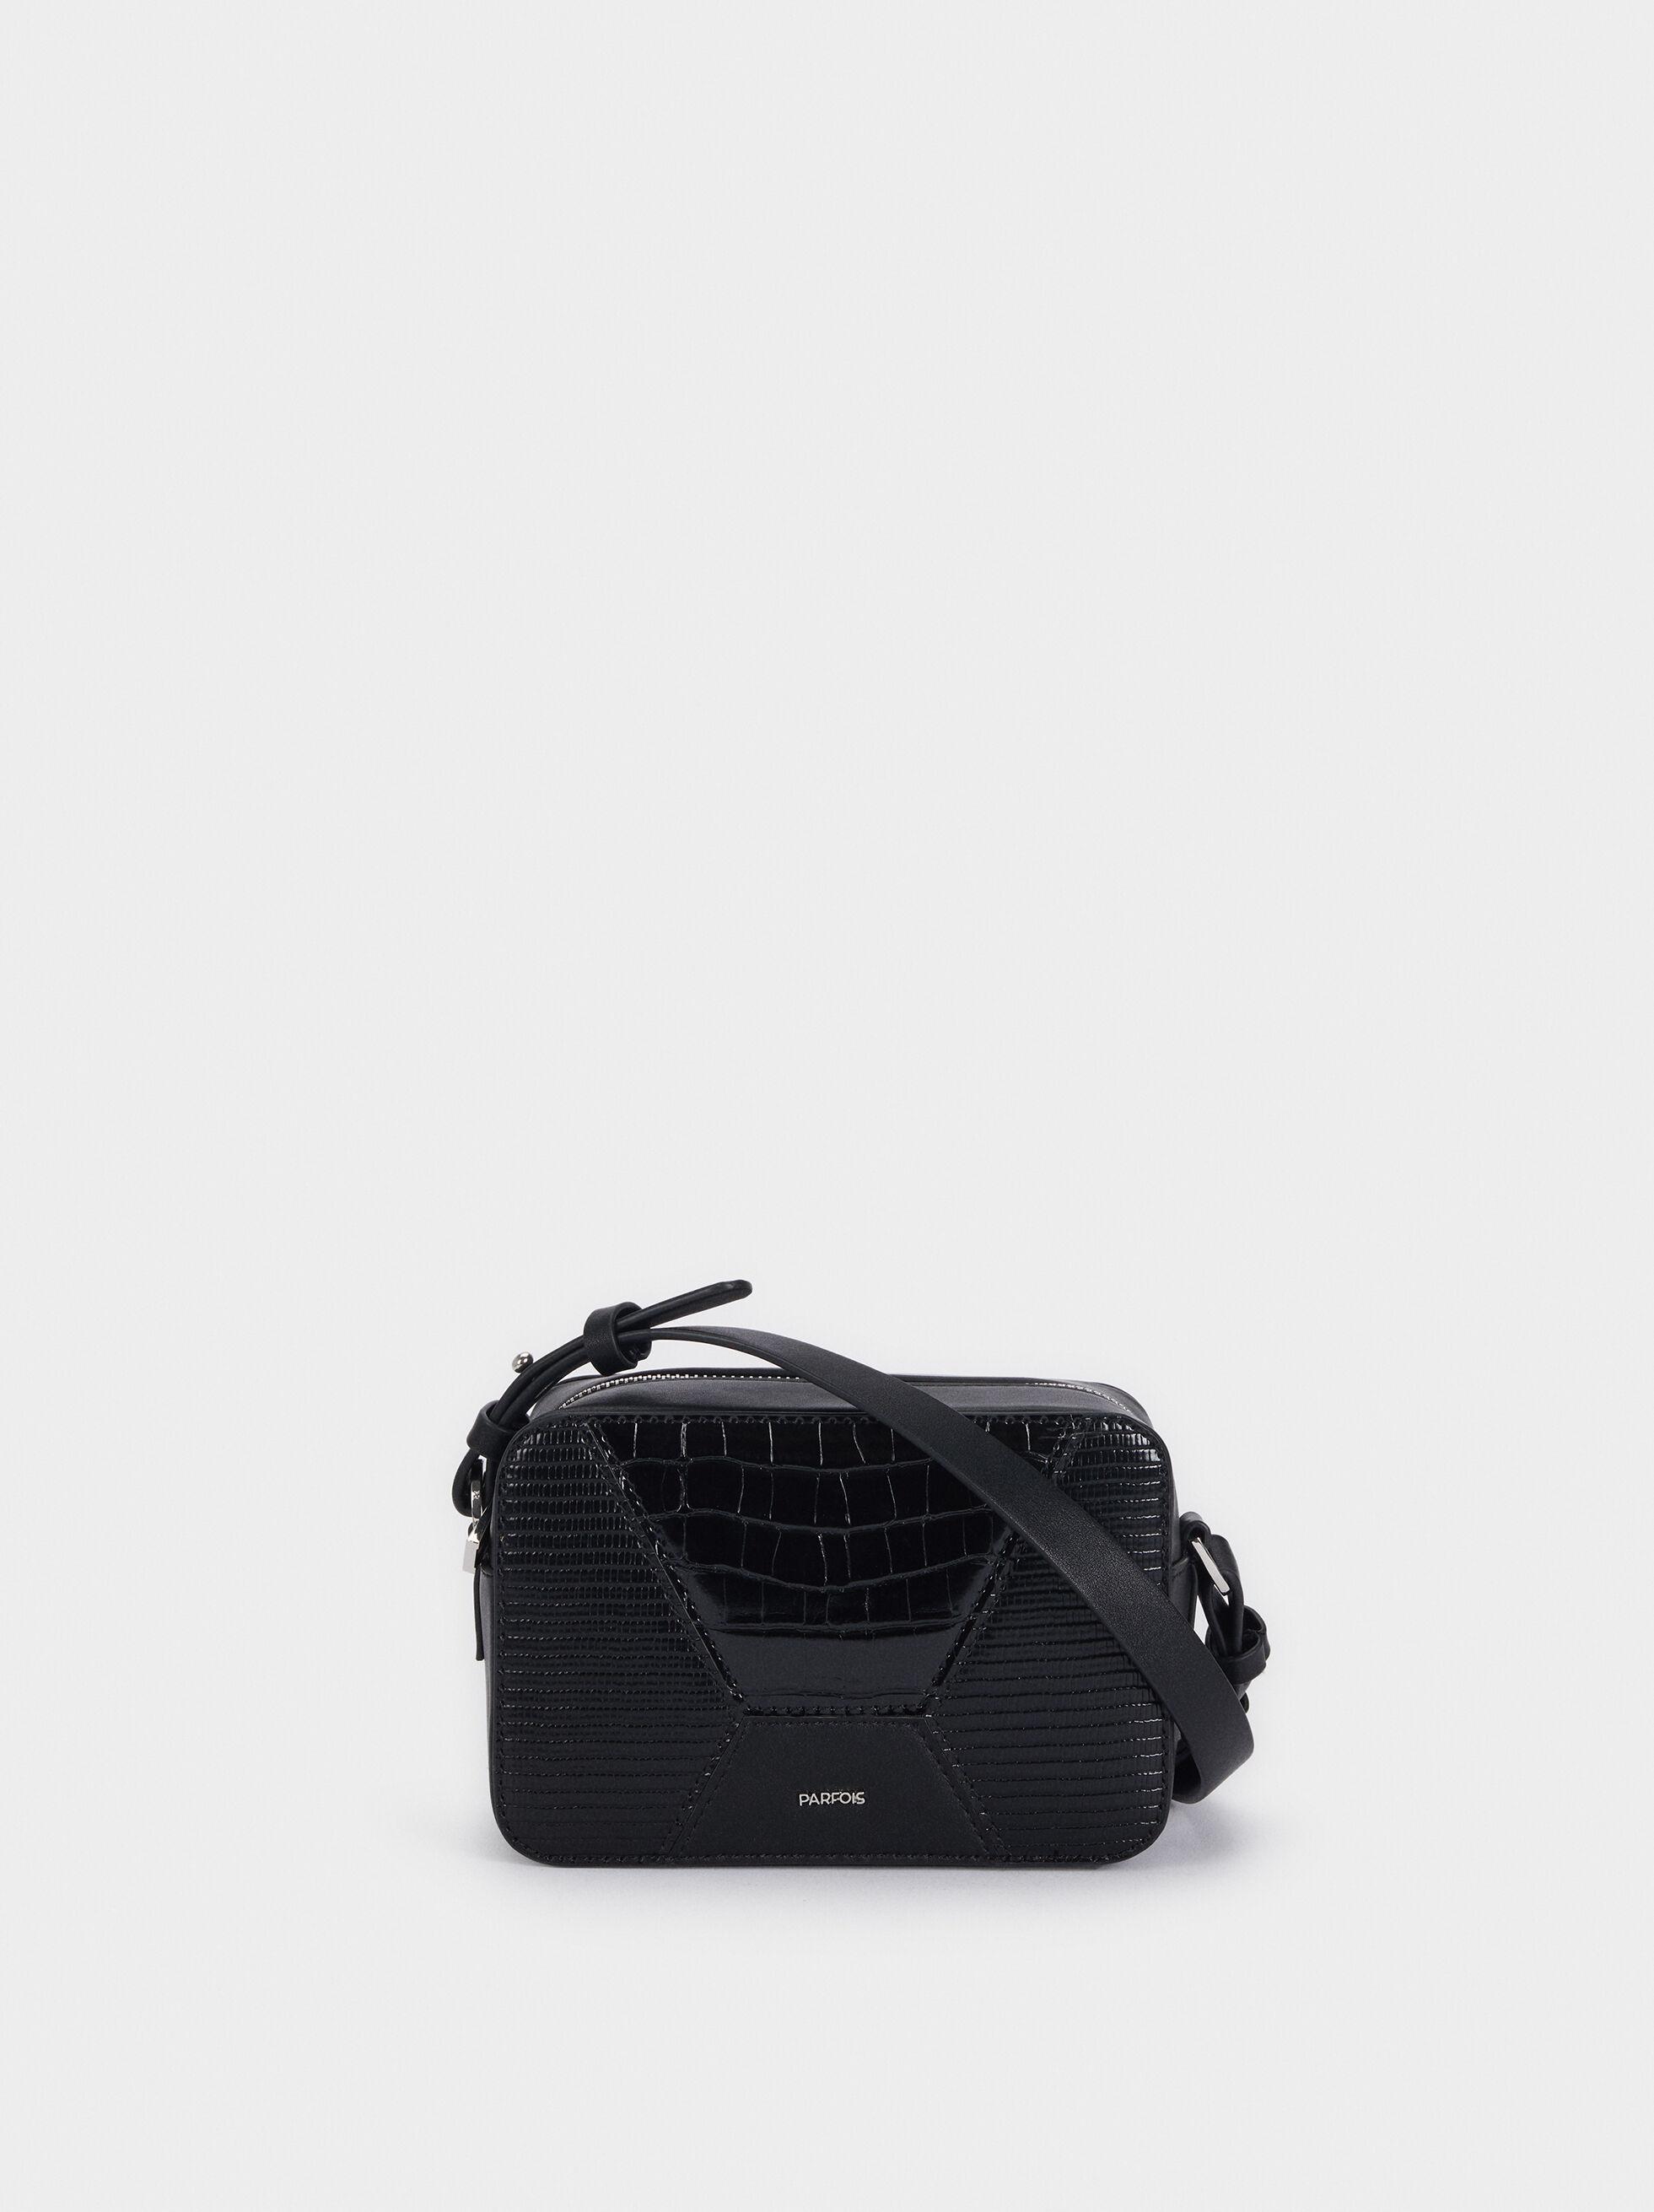 Patchwork Design Crossbody Bag, , hi-res